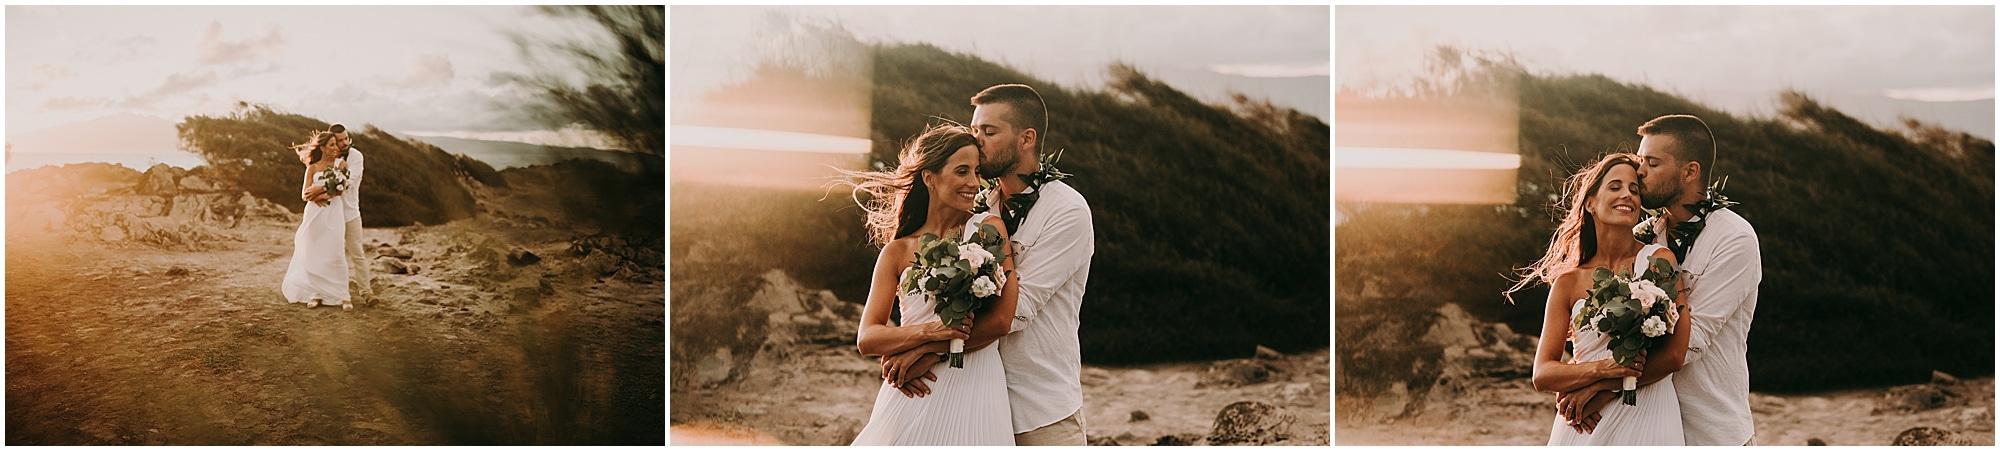 Maui wedding photographer41